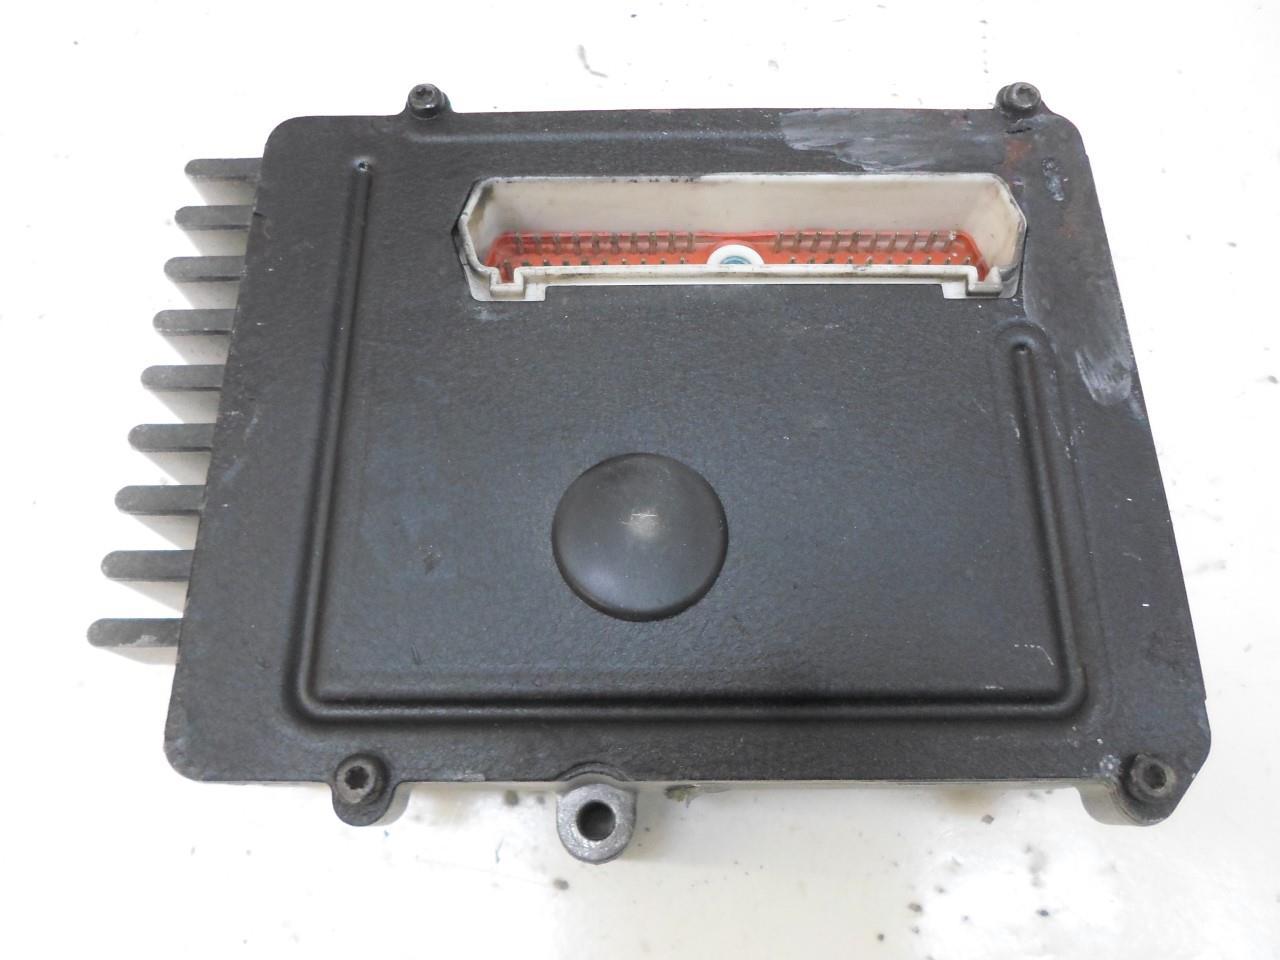 02 DODGE 1500 RAM TRANSMISSION CONTROL MODULE P56028585AC WARRANTY FREE SHIPPING